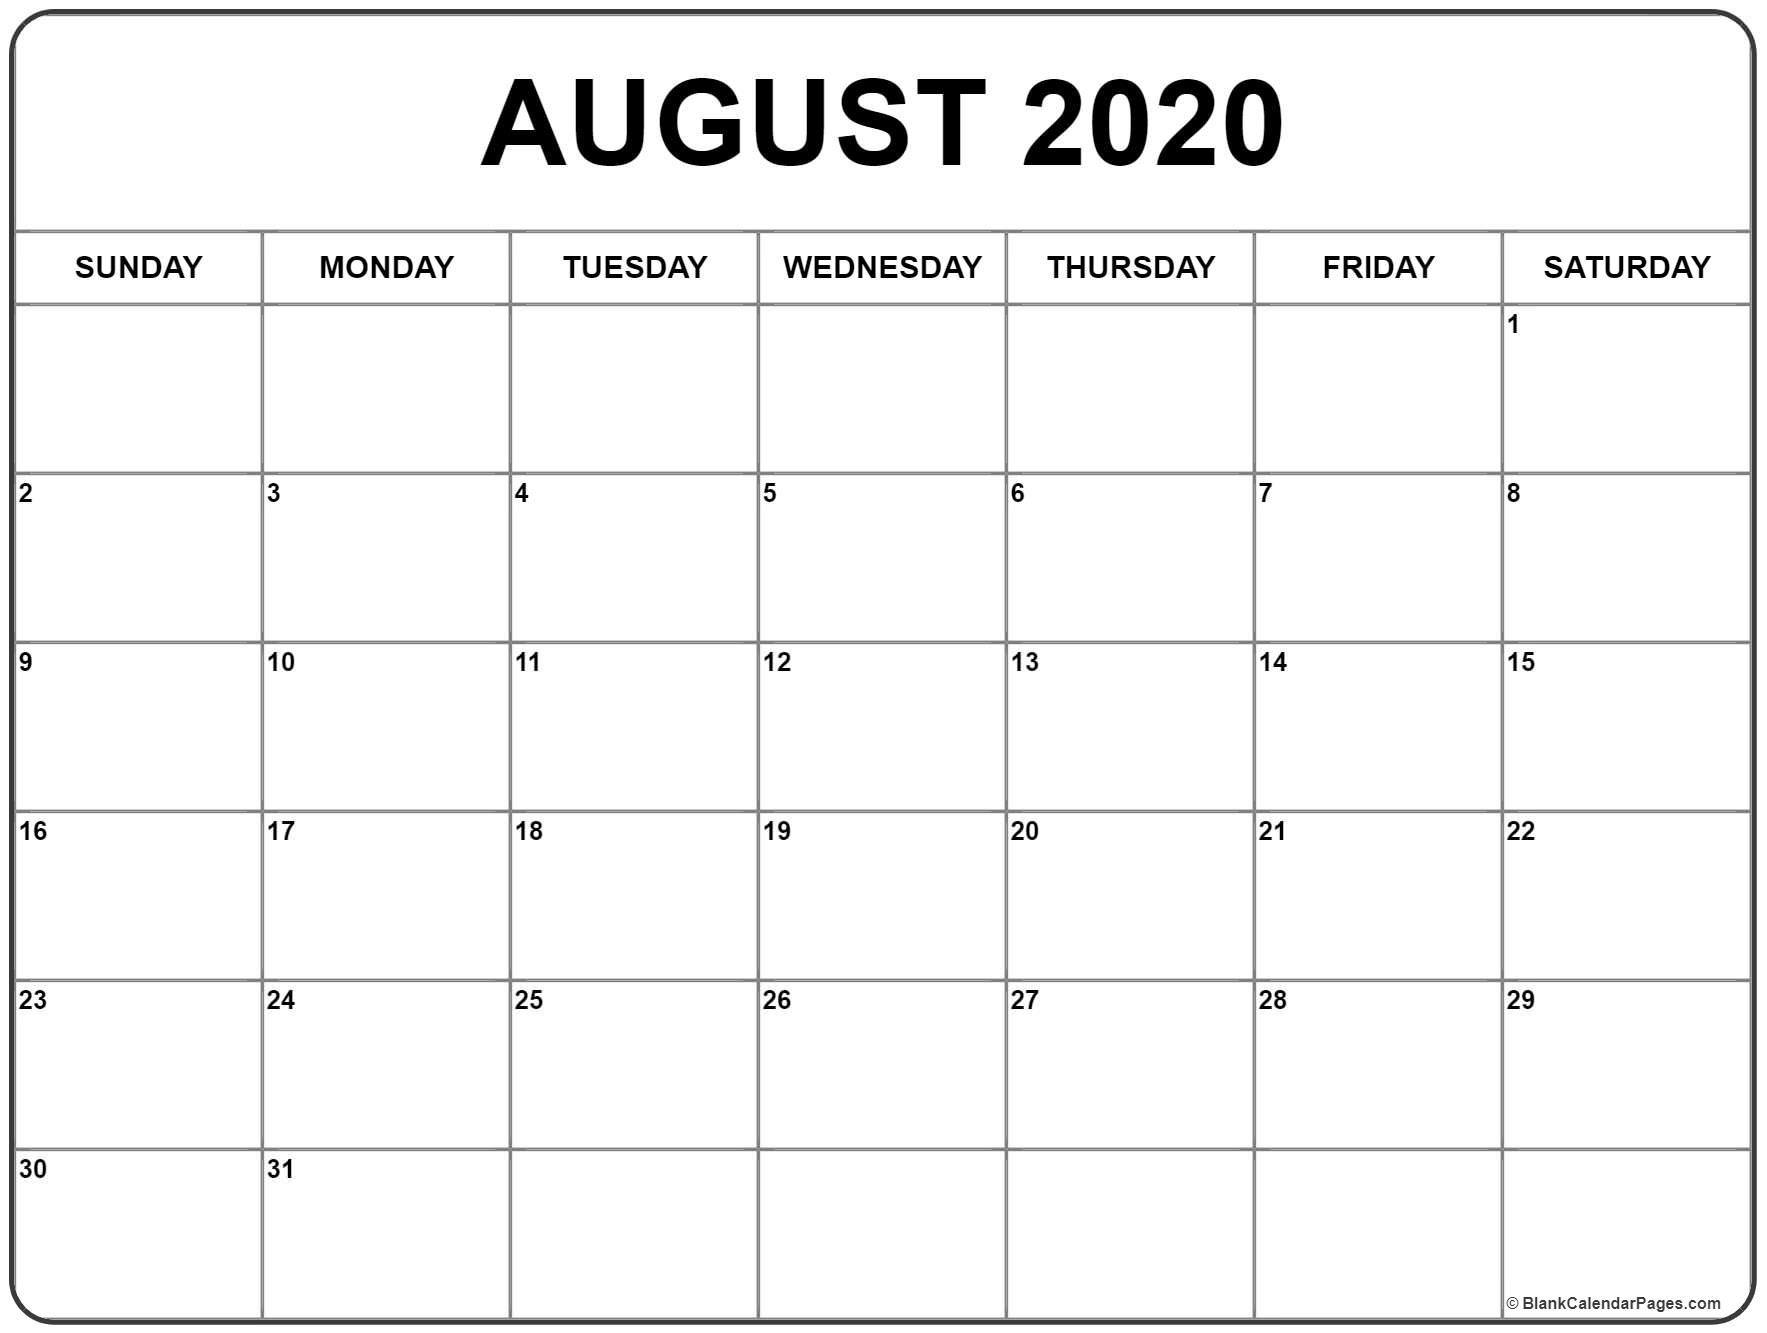 August 2020 Calendar   August Calendar, Monthly Calendar